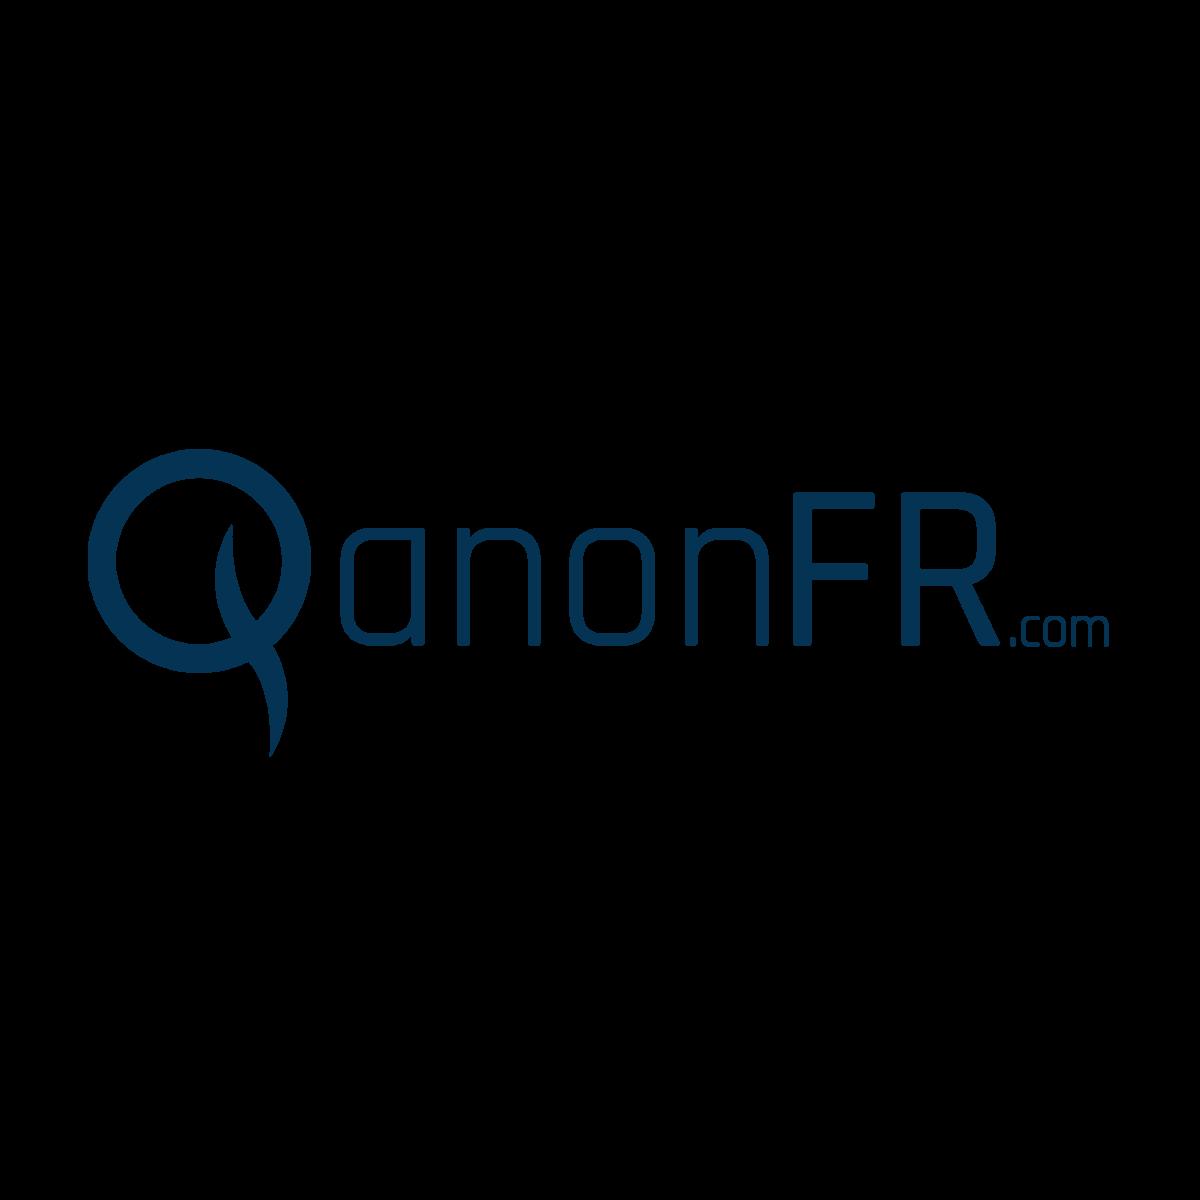 logo-qanonfr-dark-hd